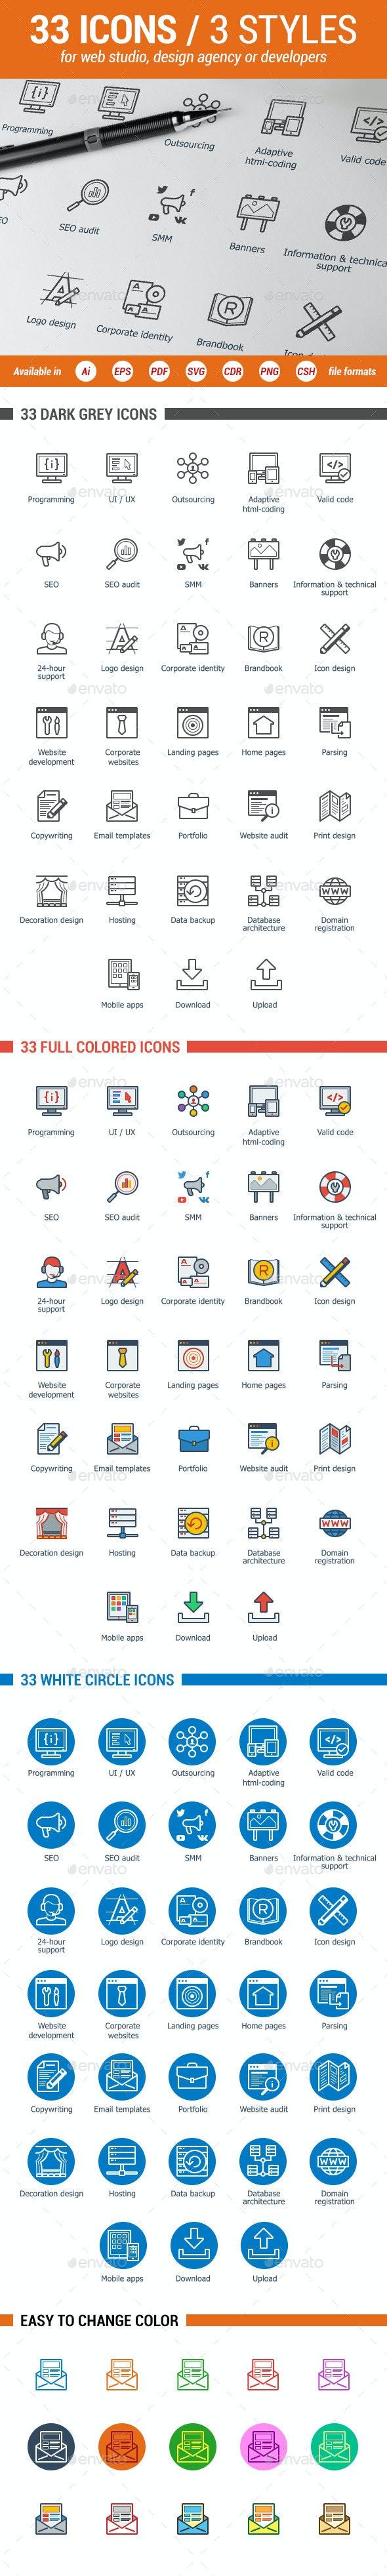 Web-Development Icons Set - Web Icons